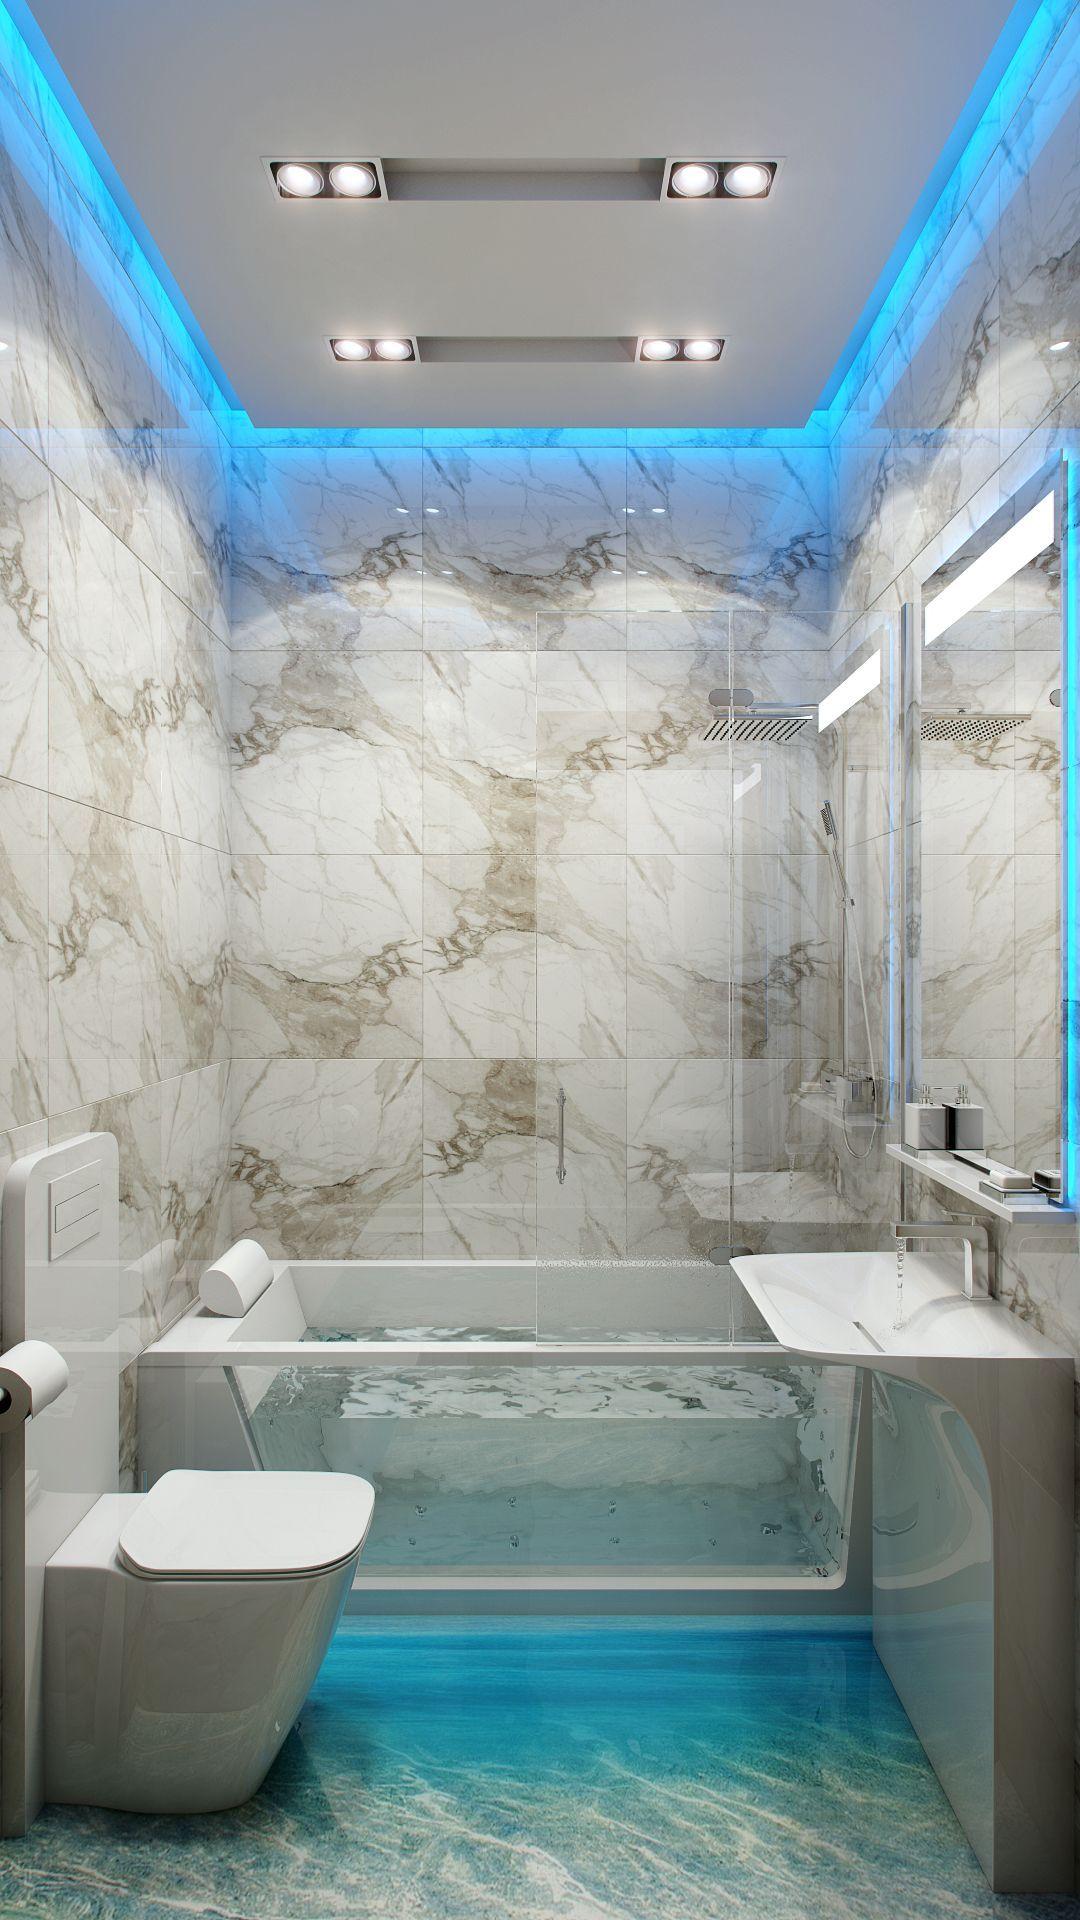 Interior Beautiful And Creative Led Interior Lighting Design Ideas Cool Bathroom Bathroom Design Luxury Bathroom Lighting Design Gorgeous Bathroom Designs